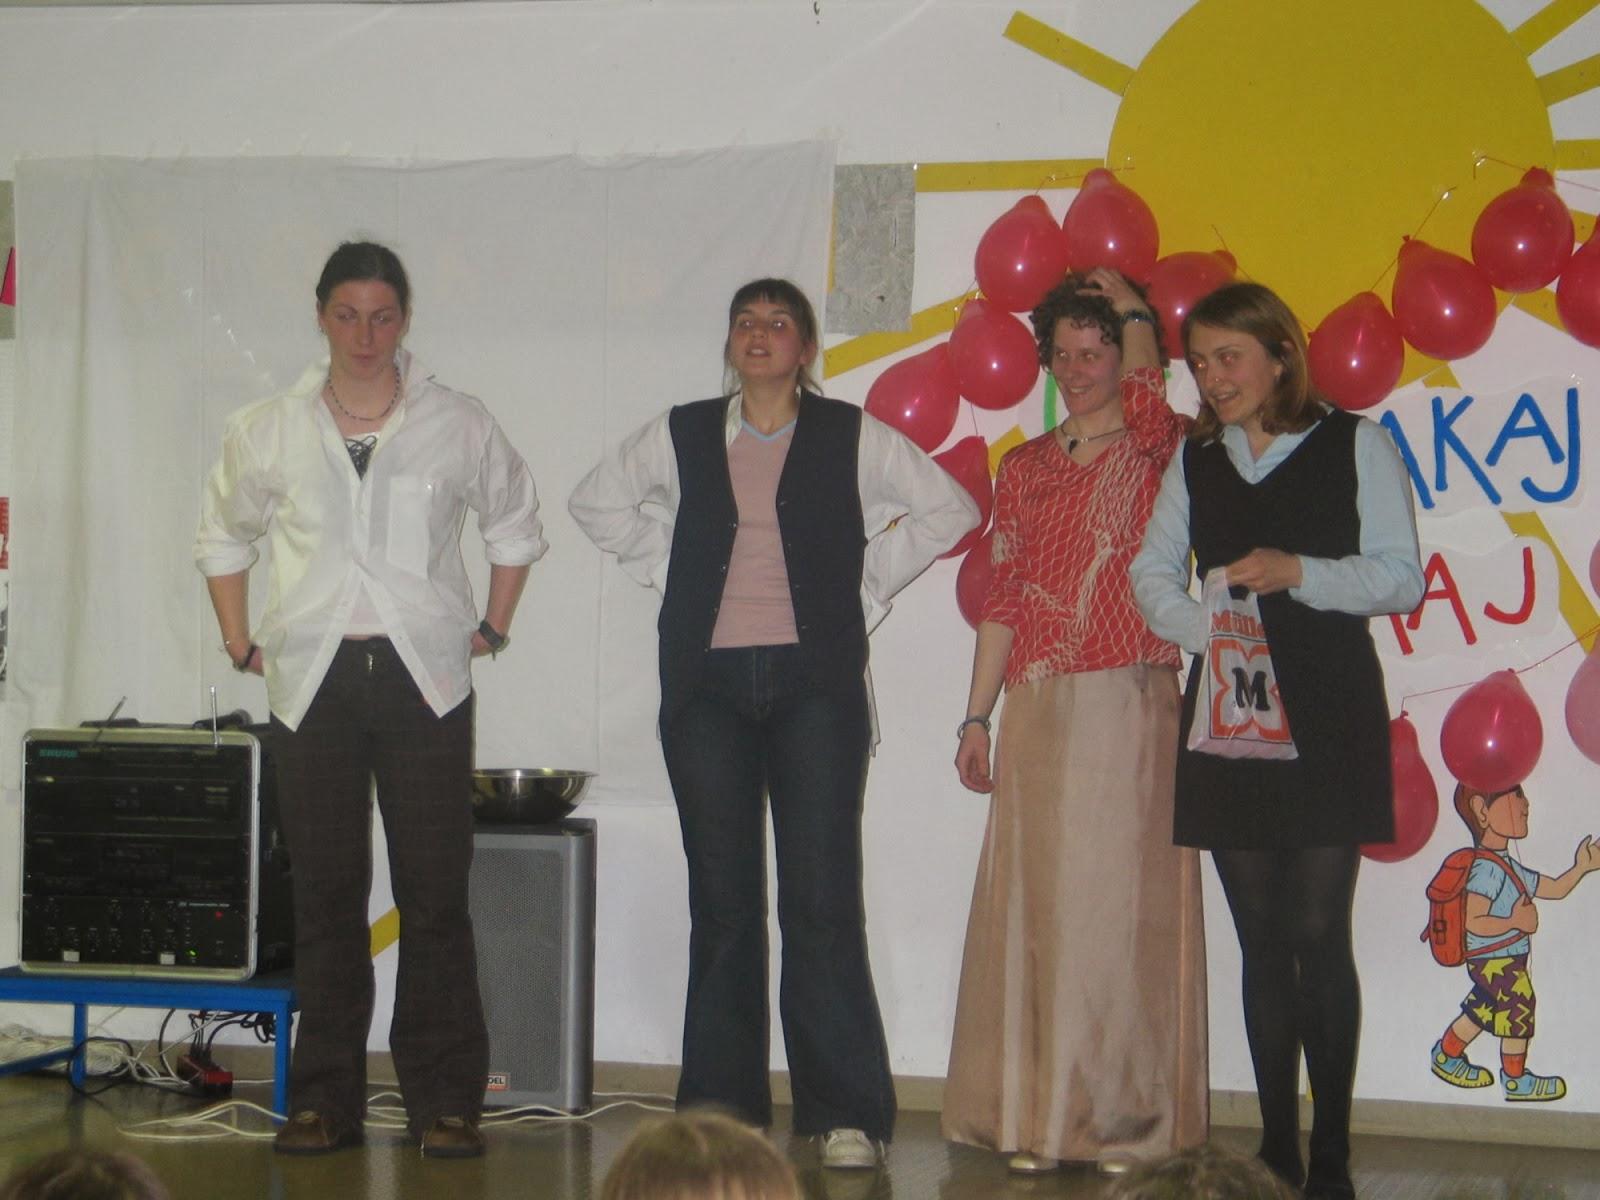 Tabosong, Ilirska Bistrica 2005 - Picture%2B003.jpg